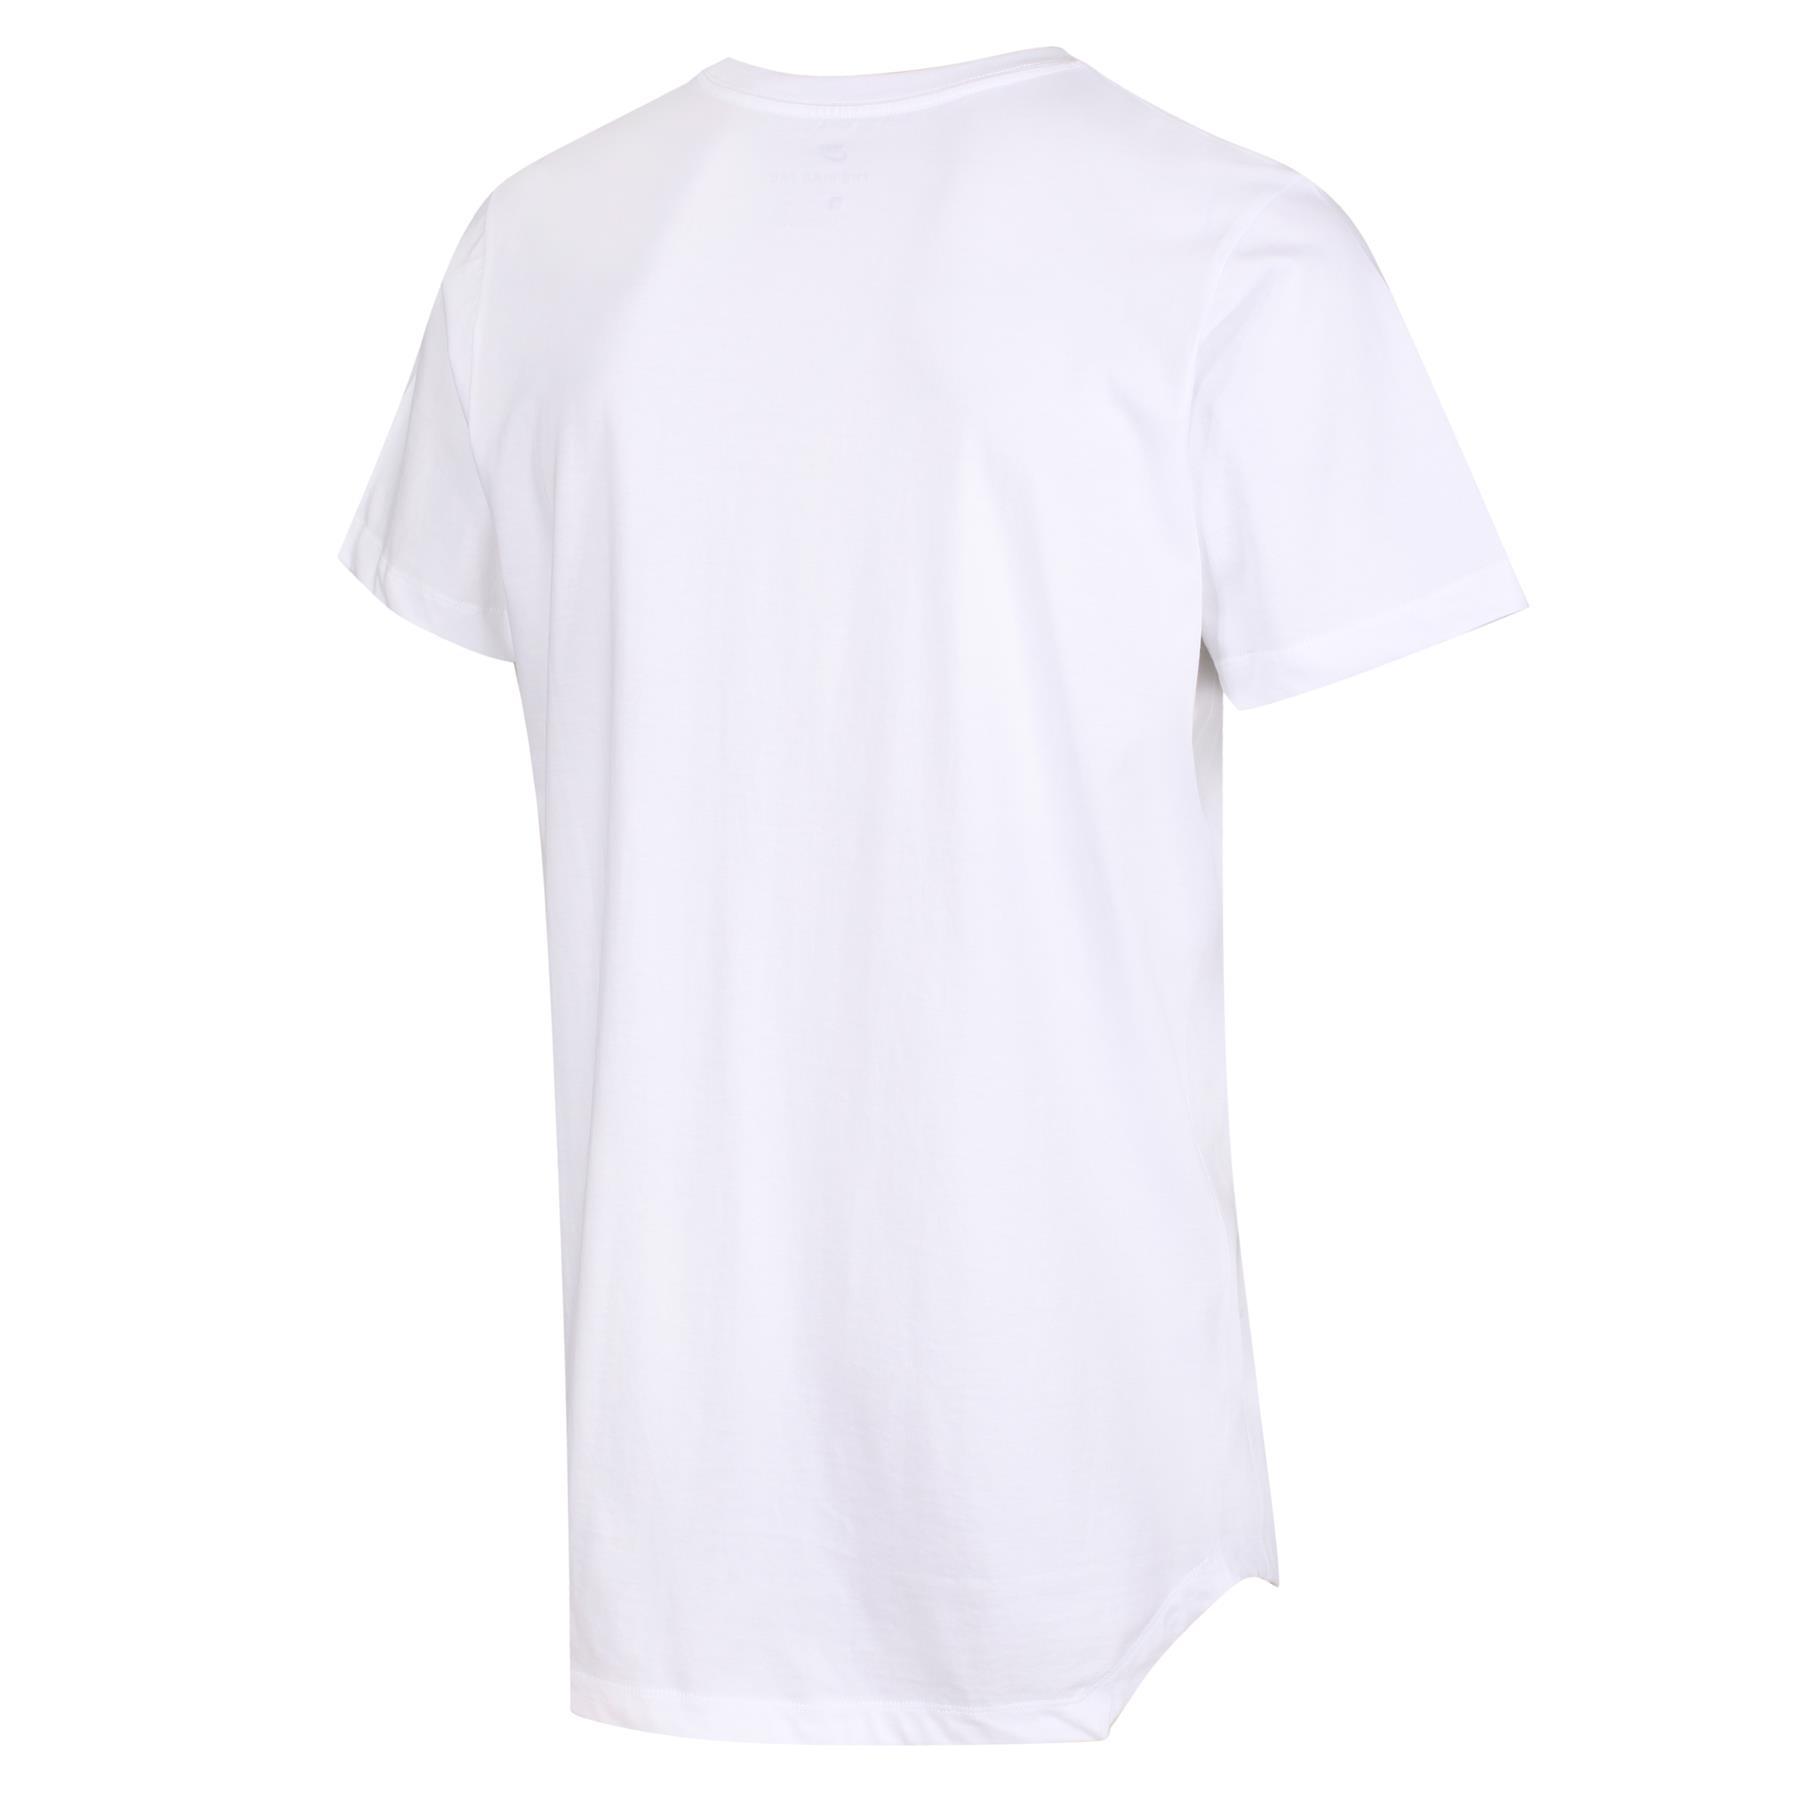 NIKE MEN/'S MODERN TALL TEE T-SHIRT WHITE BLACK RETRO VINTAGE SUMMER NEW